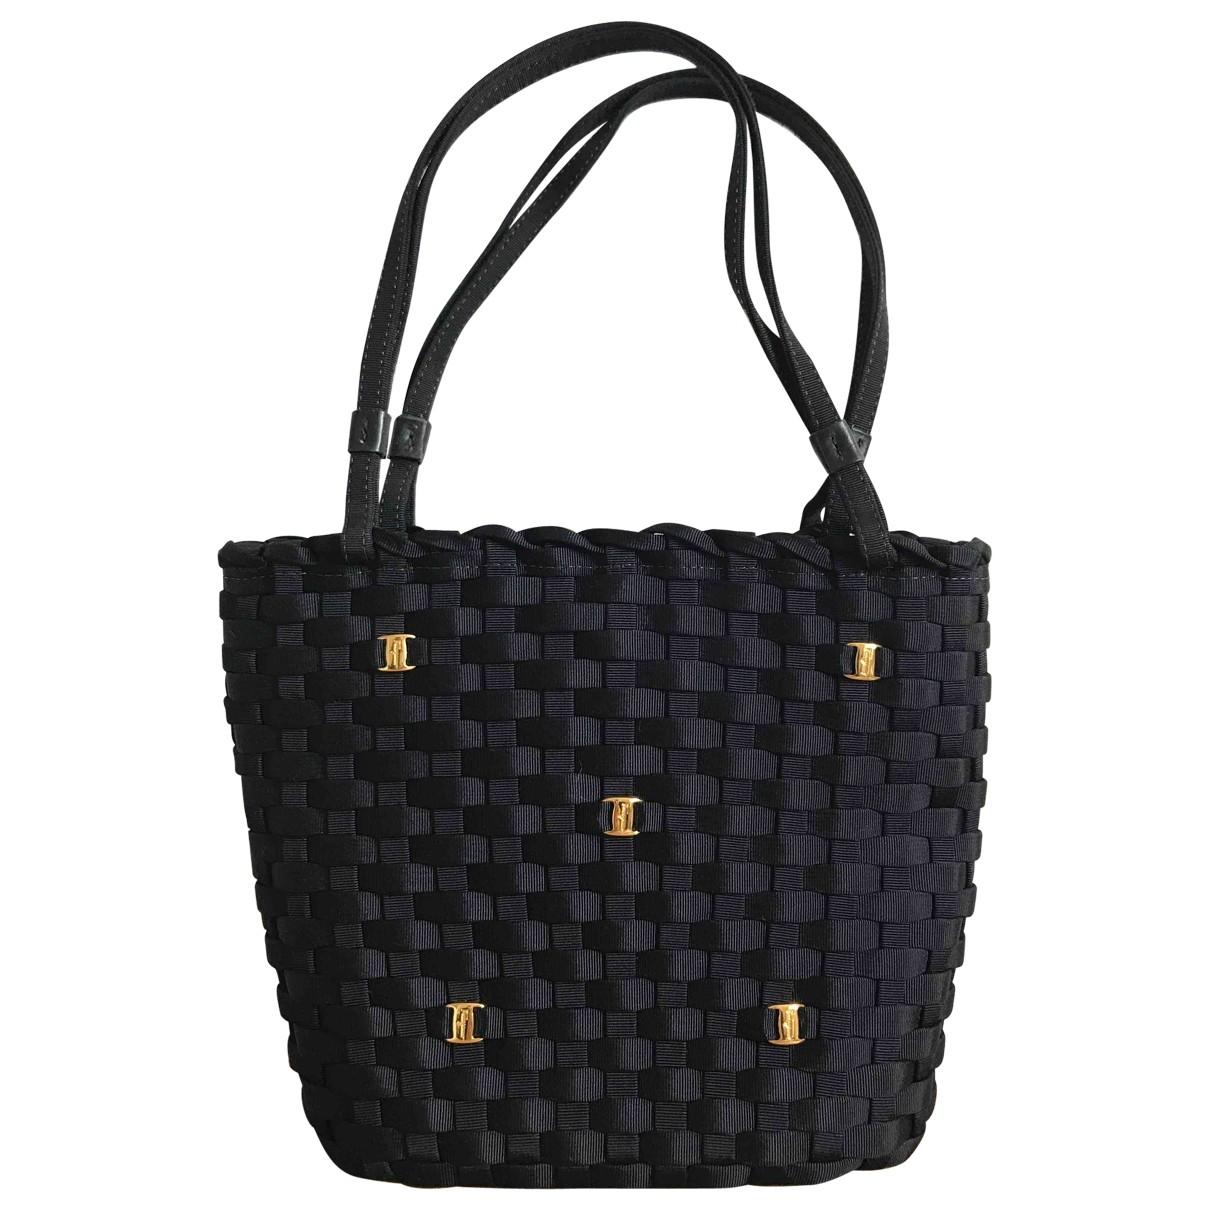 Salvatore Ferragamo \N Navy Cloth handbag for Women \N